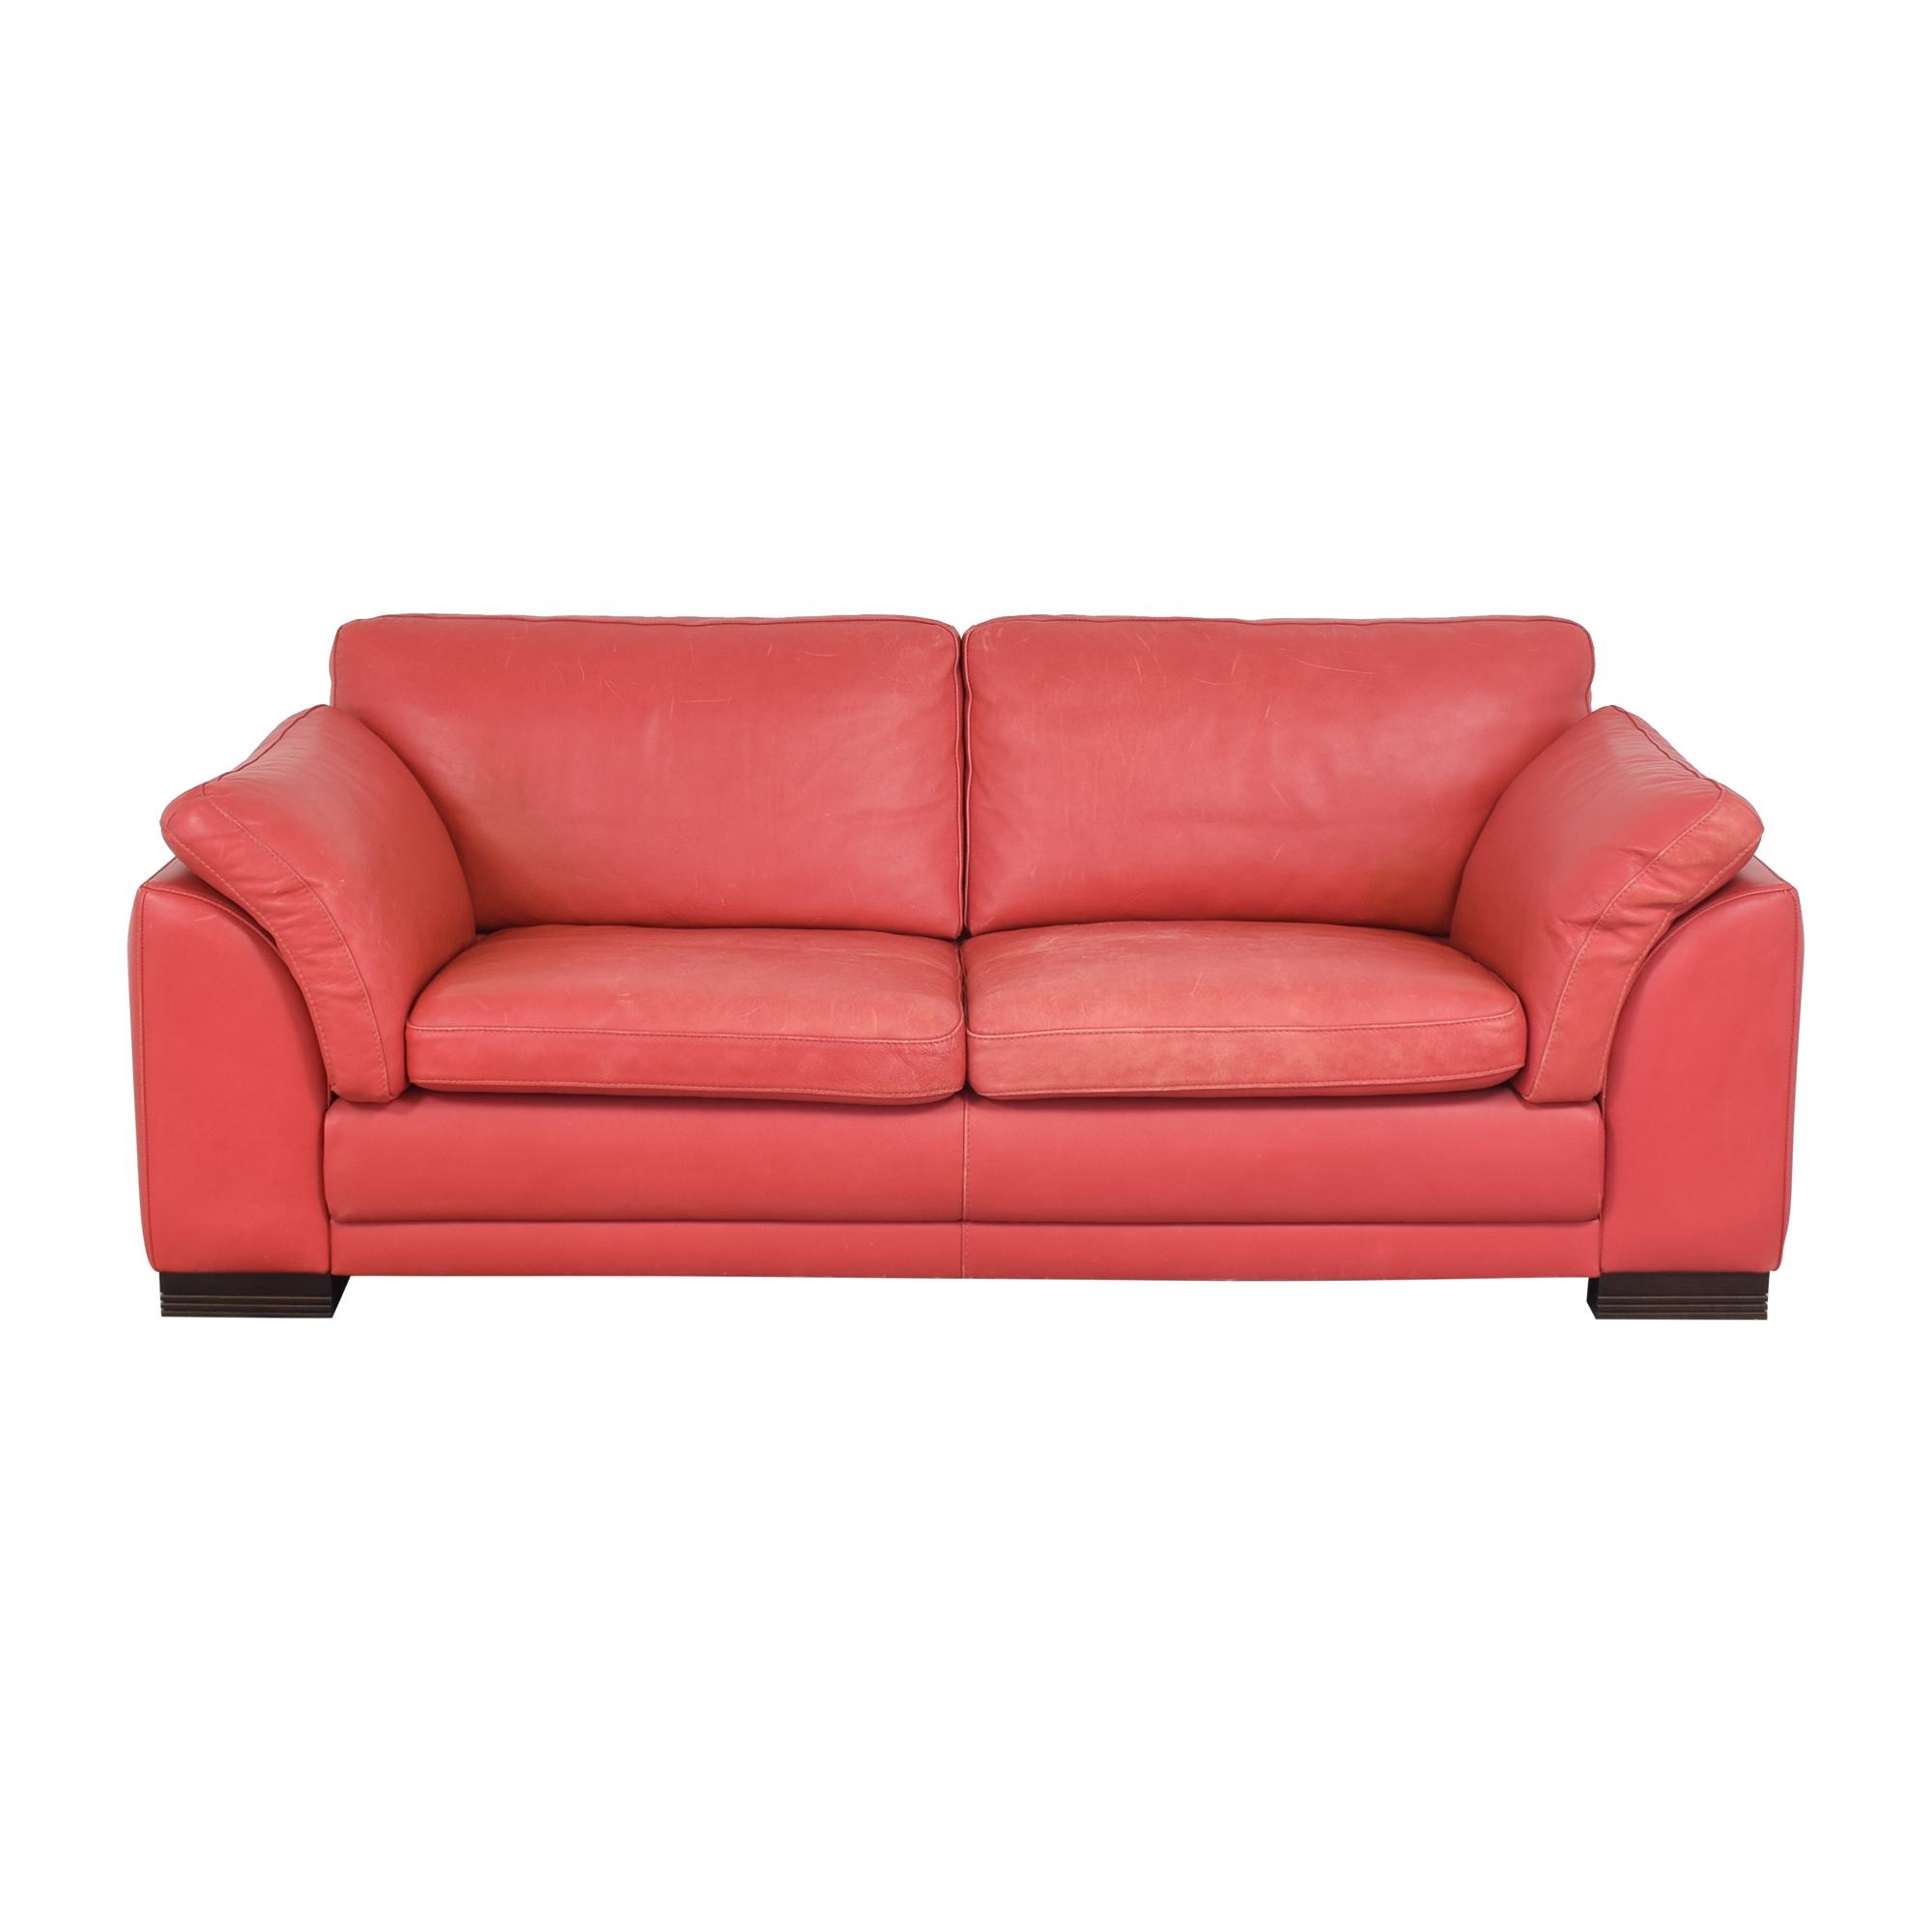 Roche Bobois Roche Bobois Two Cushion Sofa ma